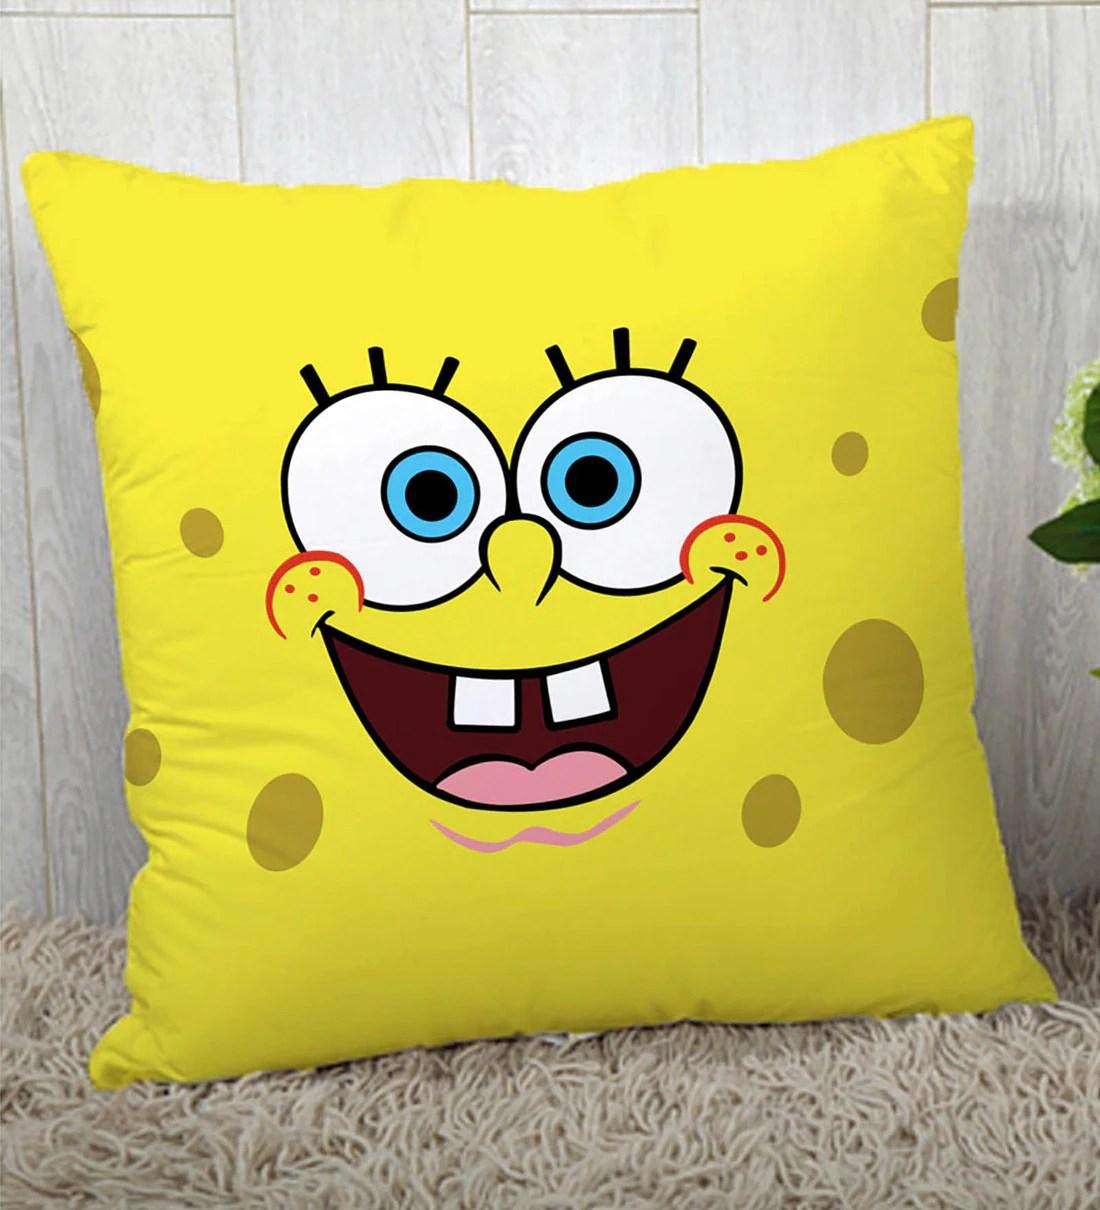 spongebob silk cushion cover in yellow colour